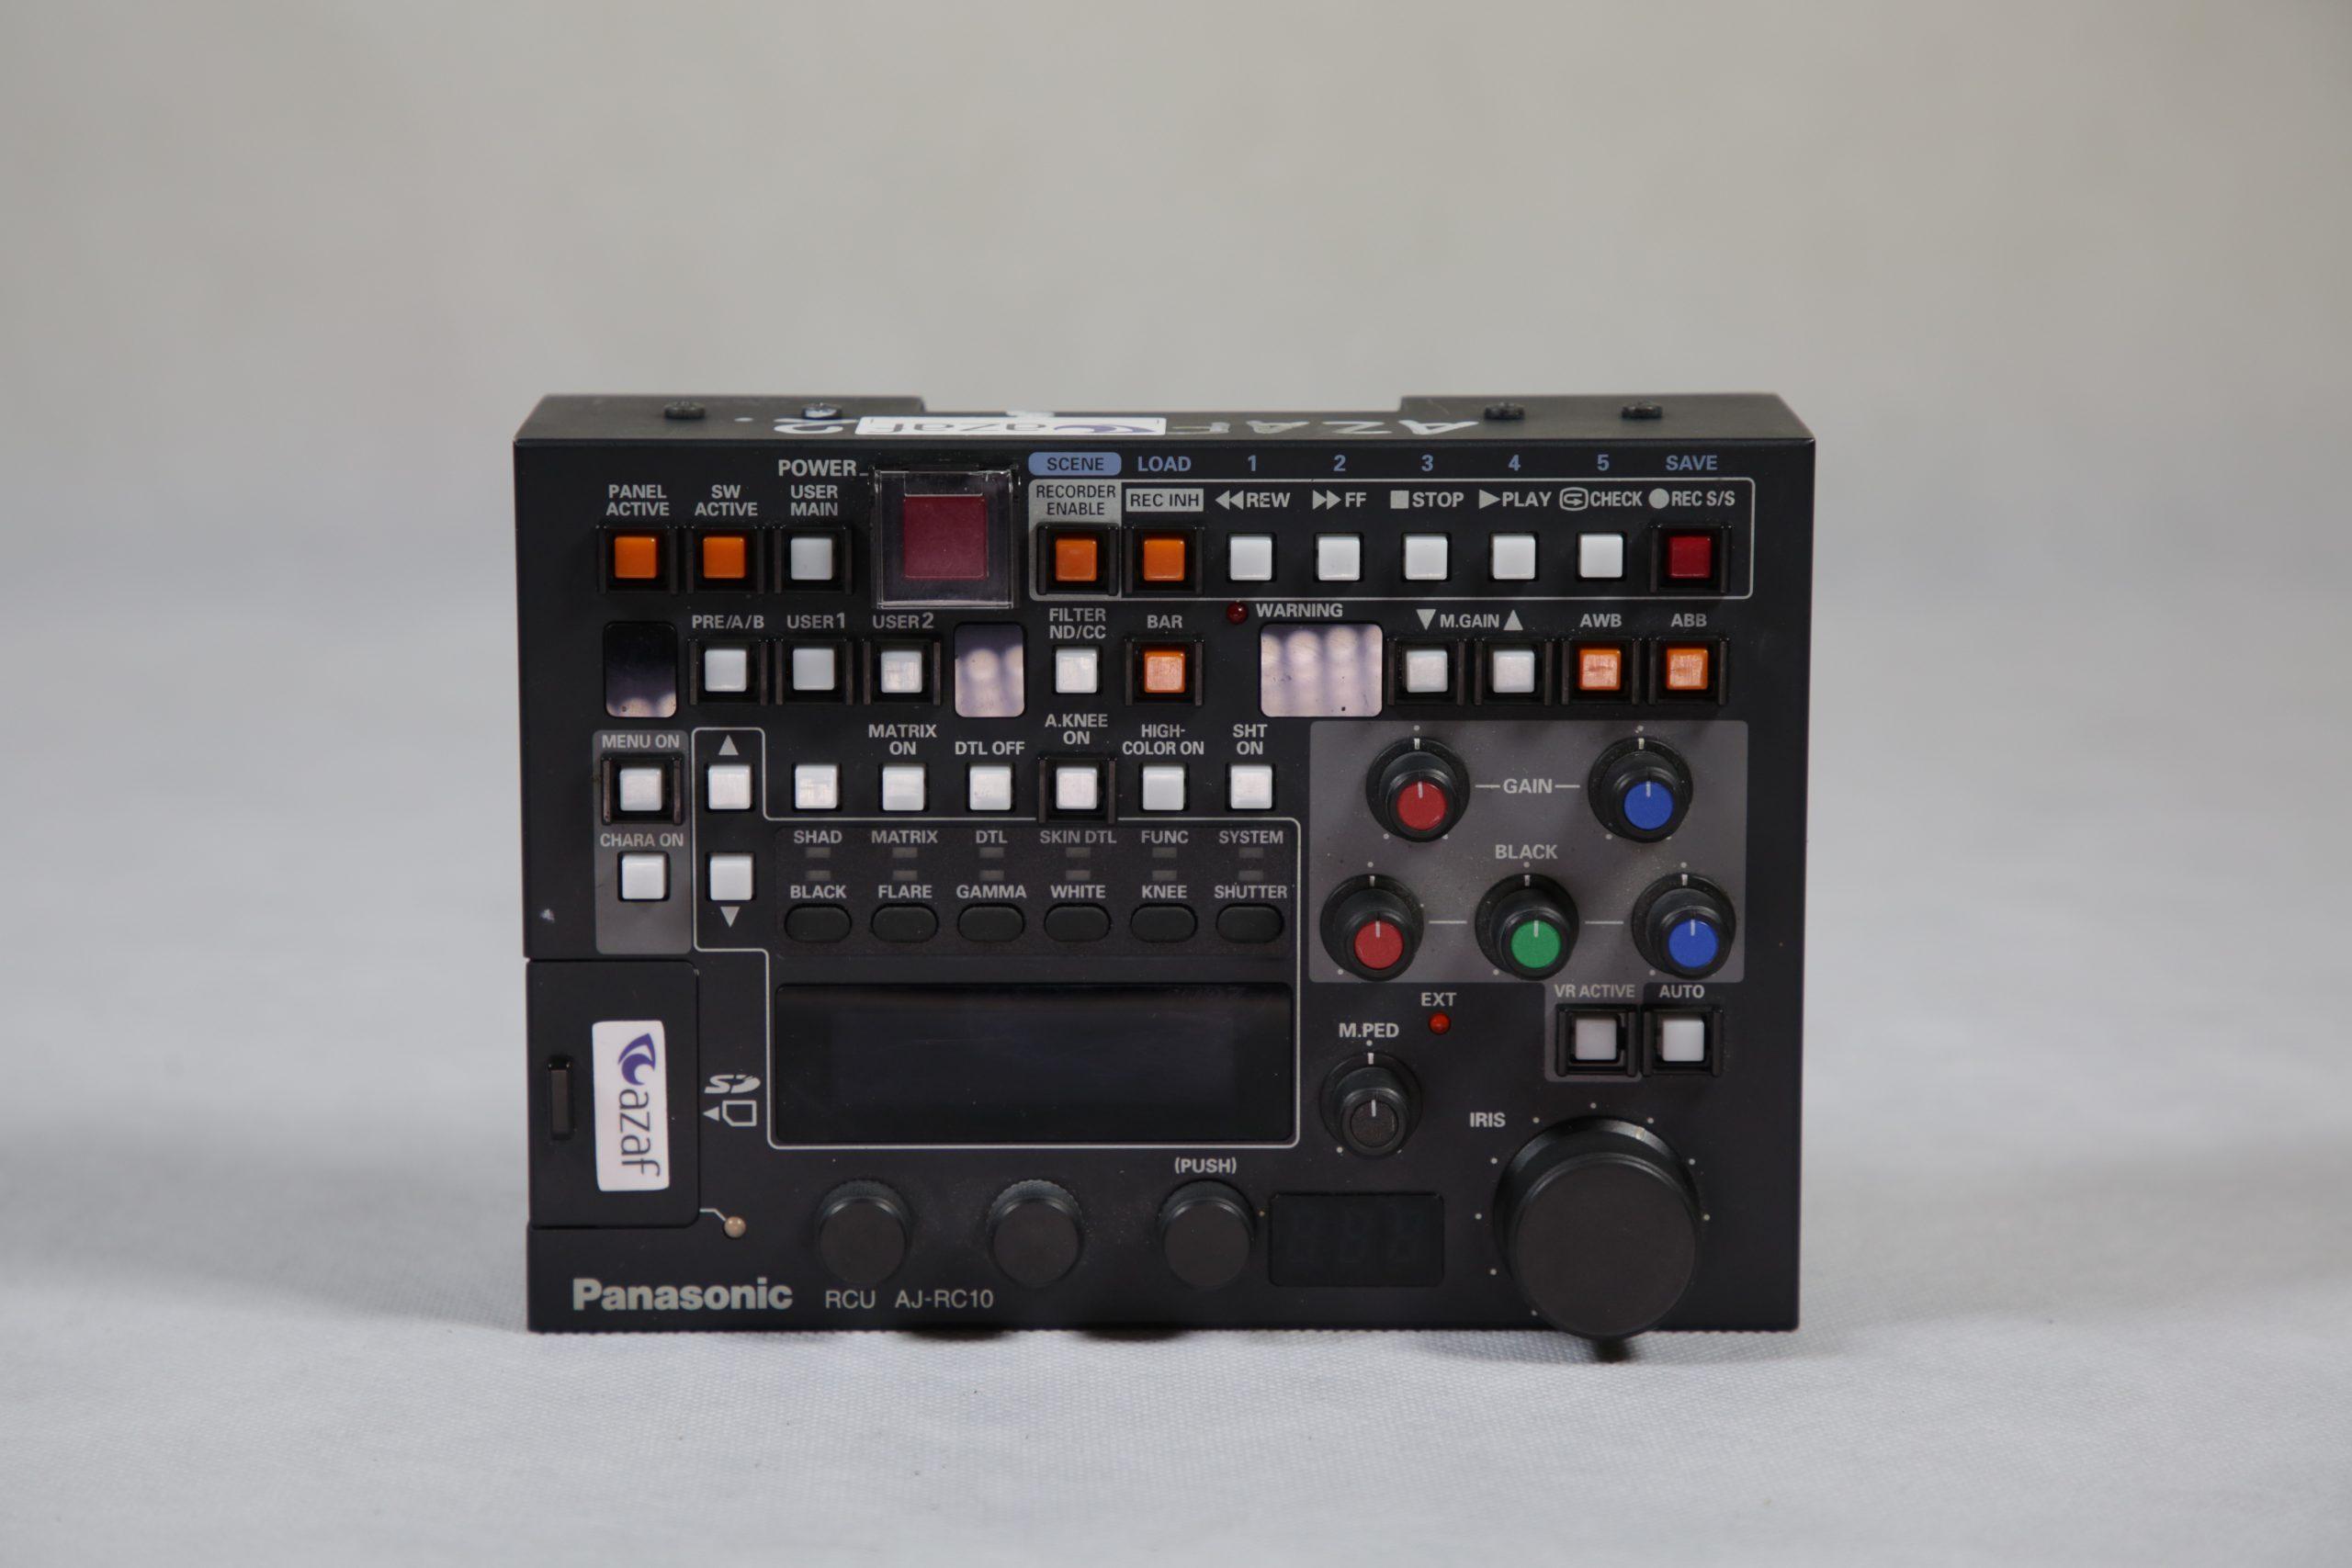 Panasonic RCU AJ-RC10